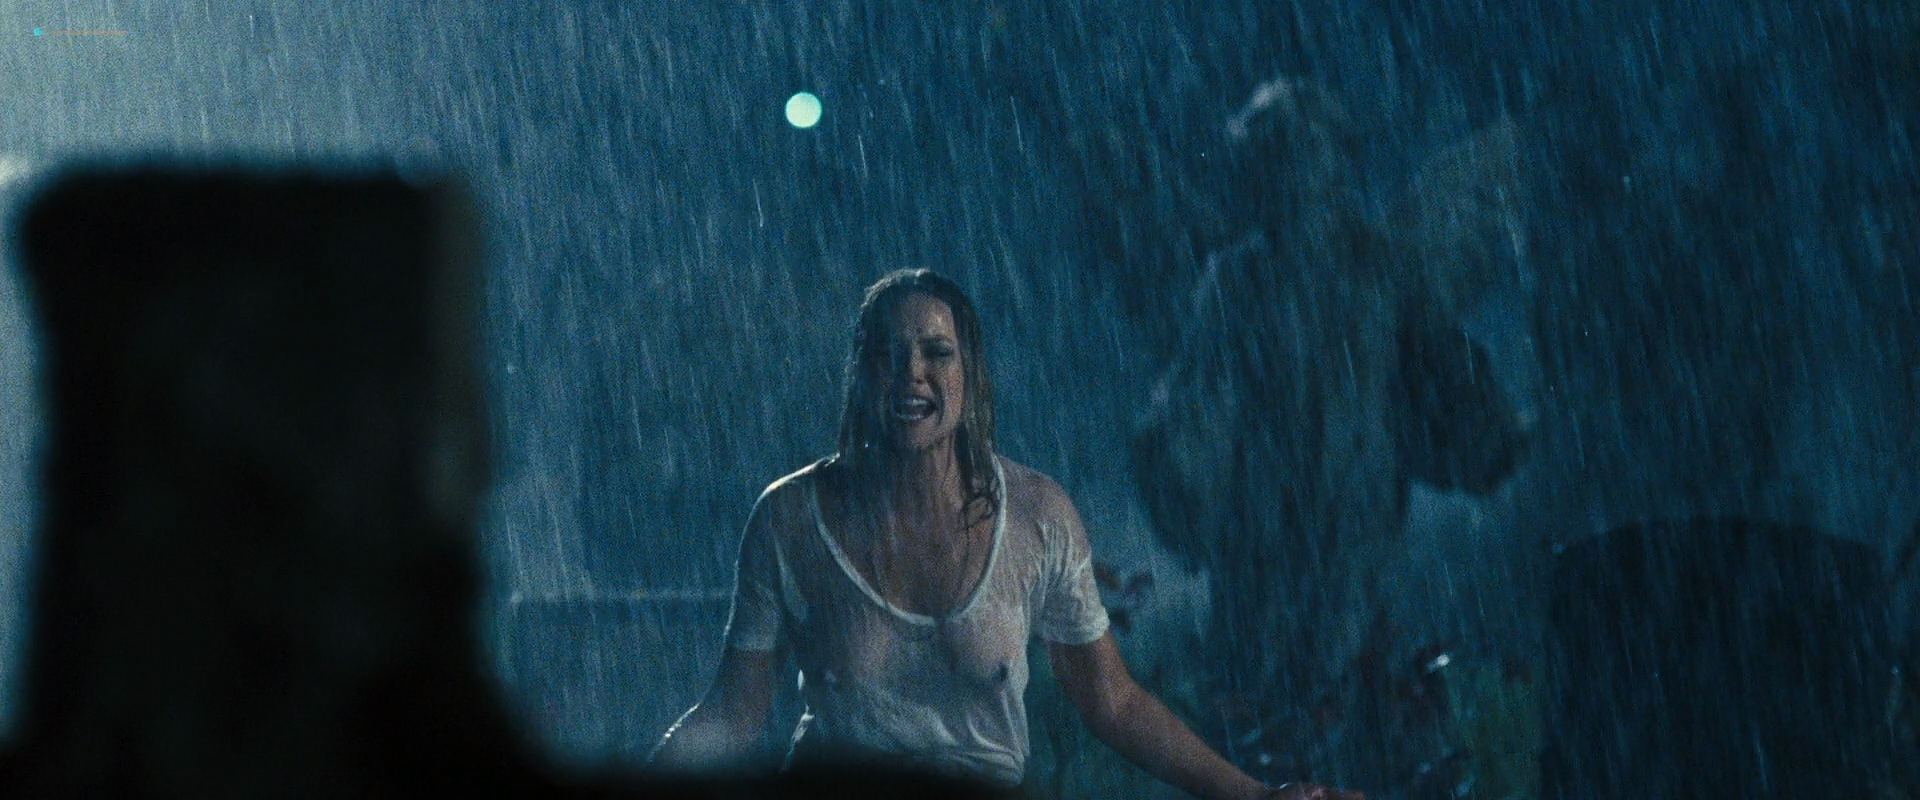 0110164402218_01_Olga-Kurylenko-hot-Abbie-Cornish-see-through-and-Christine-Marzano-nude-–-Seven-Psychopaths-2012-HD-1080p-09.jpg